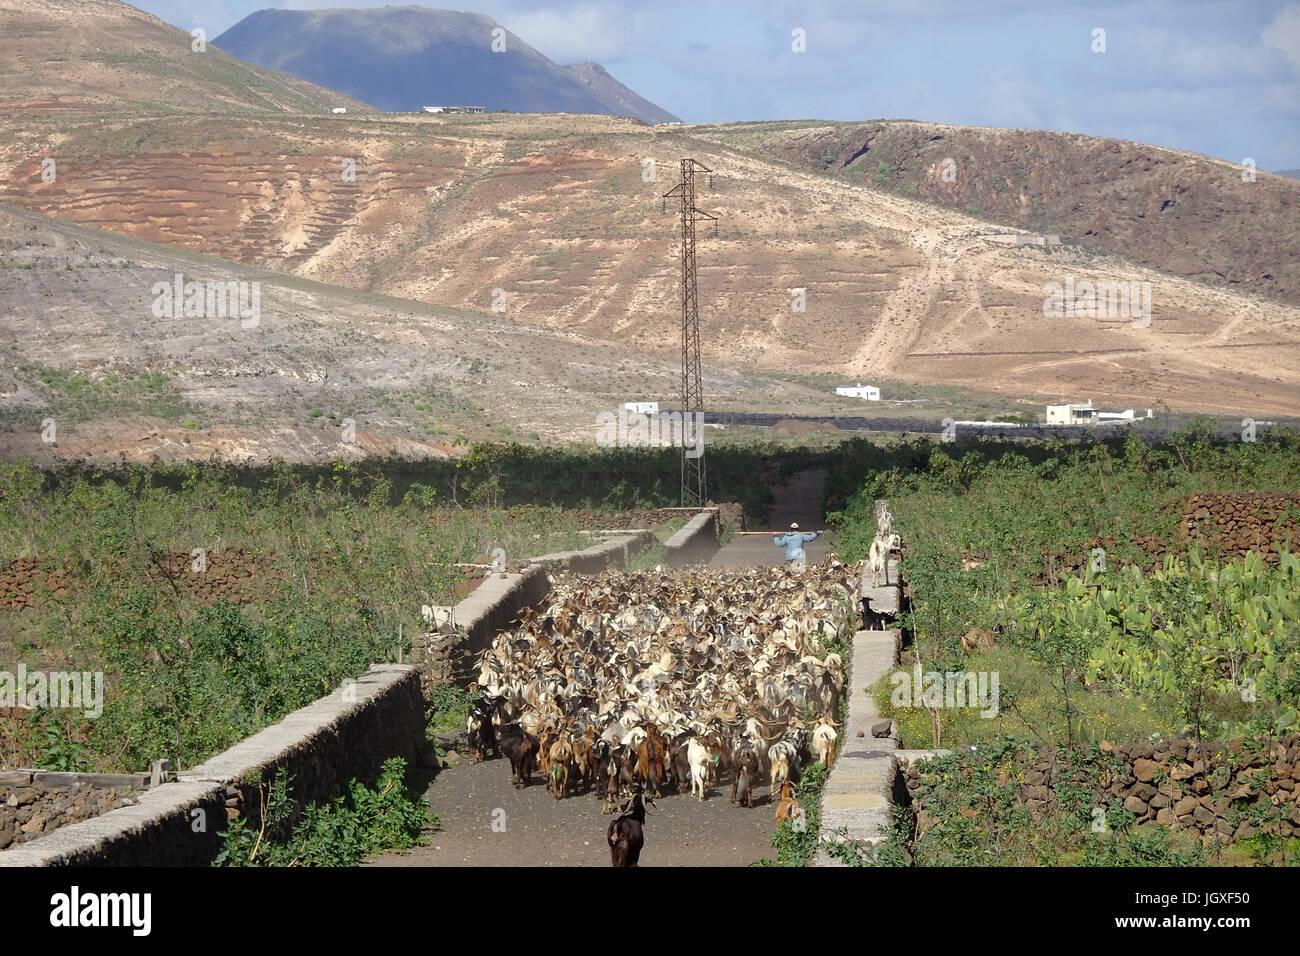 Ziegenherde bei Guatiza, Lanzarote, Kanarische Inseln, Europa | Goat herd at Guatiza, Lanzarote, Canary islands, - Stock Image